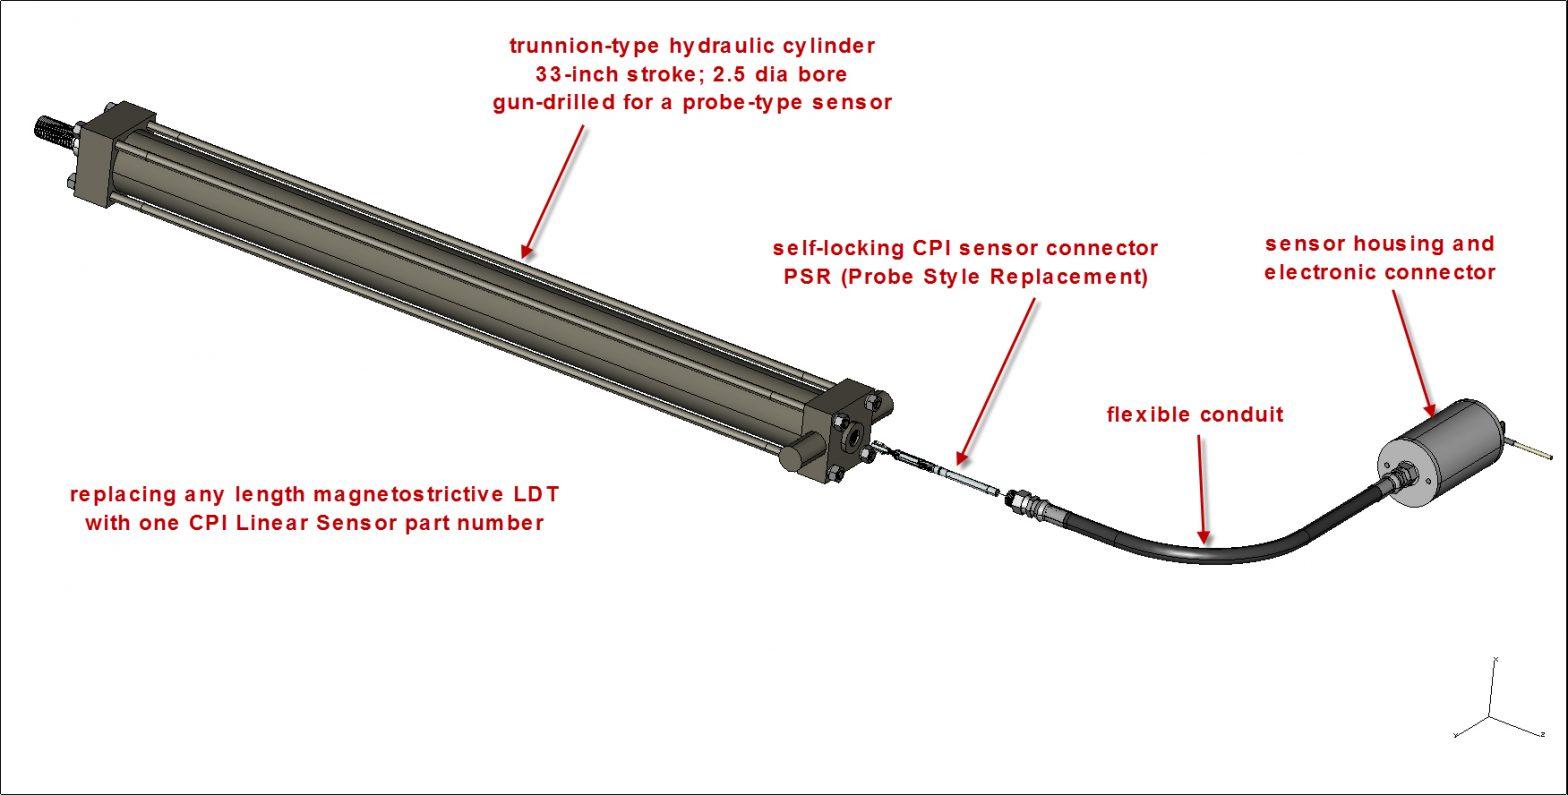 Linear Position Sensor use in long stroke hydraulic cylinder